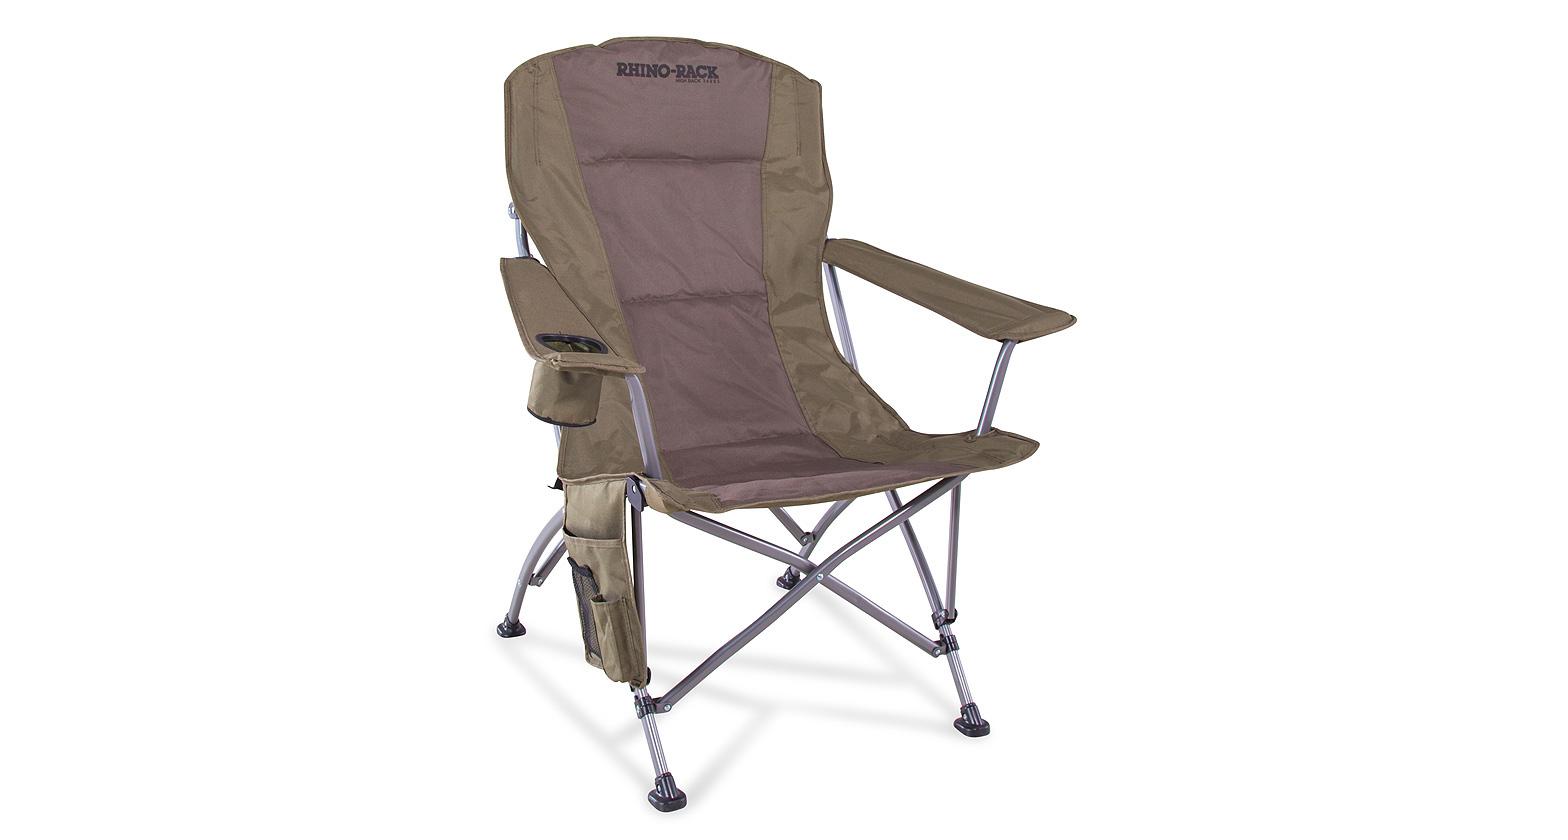 folding chair storage hooks gym bench rhino rack high back camping